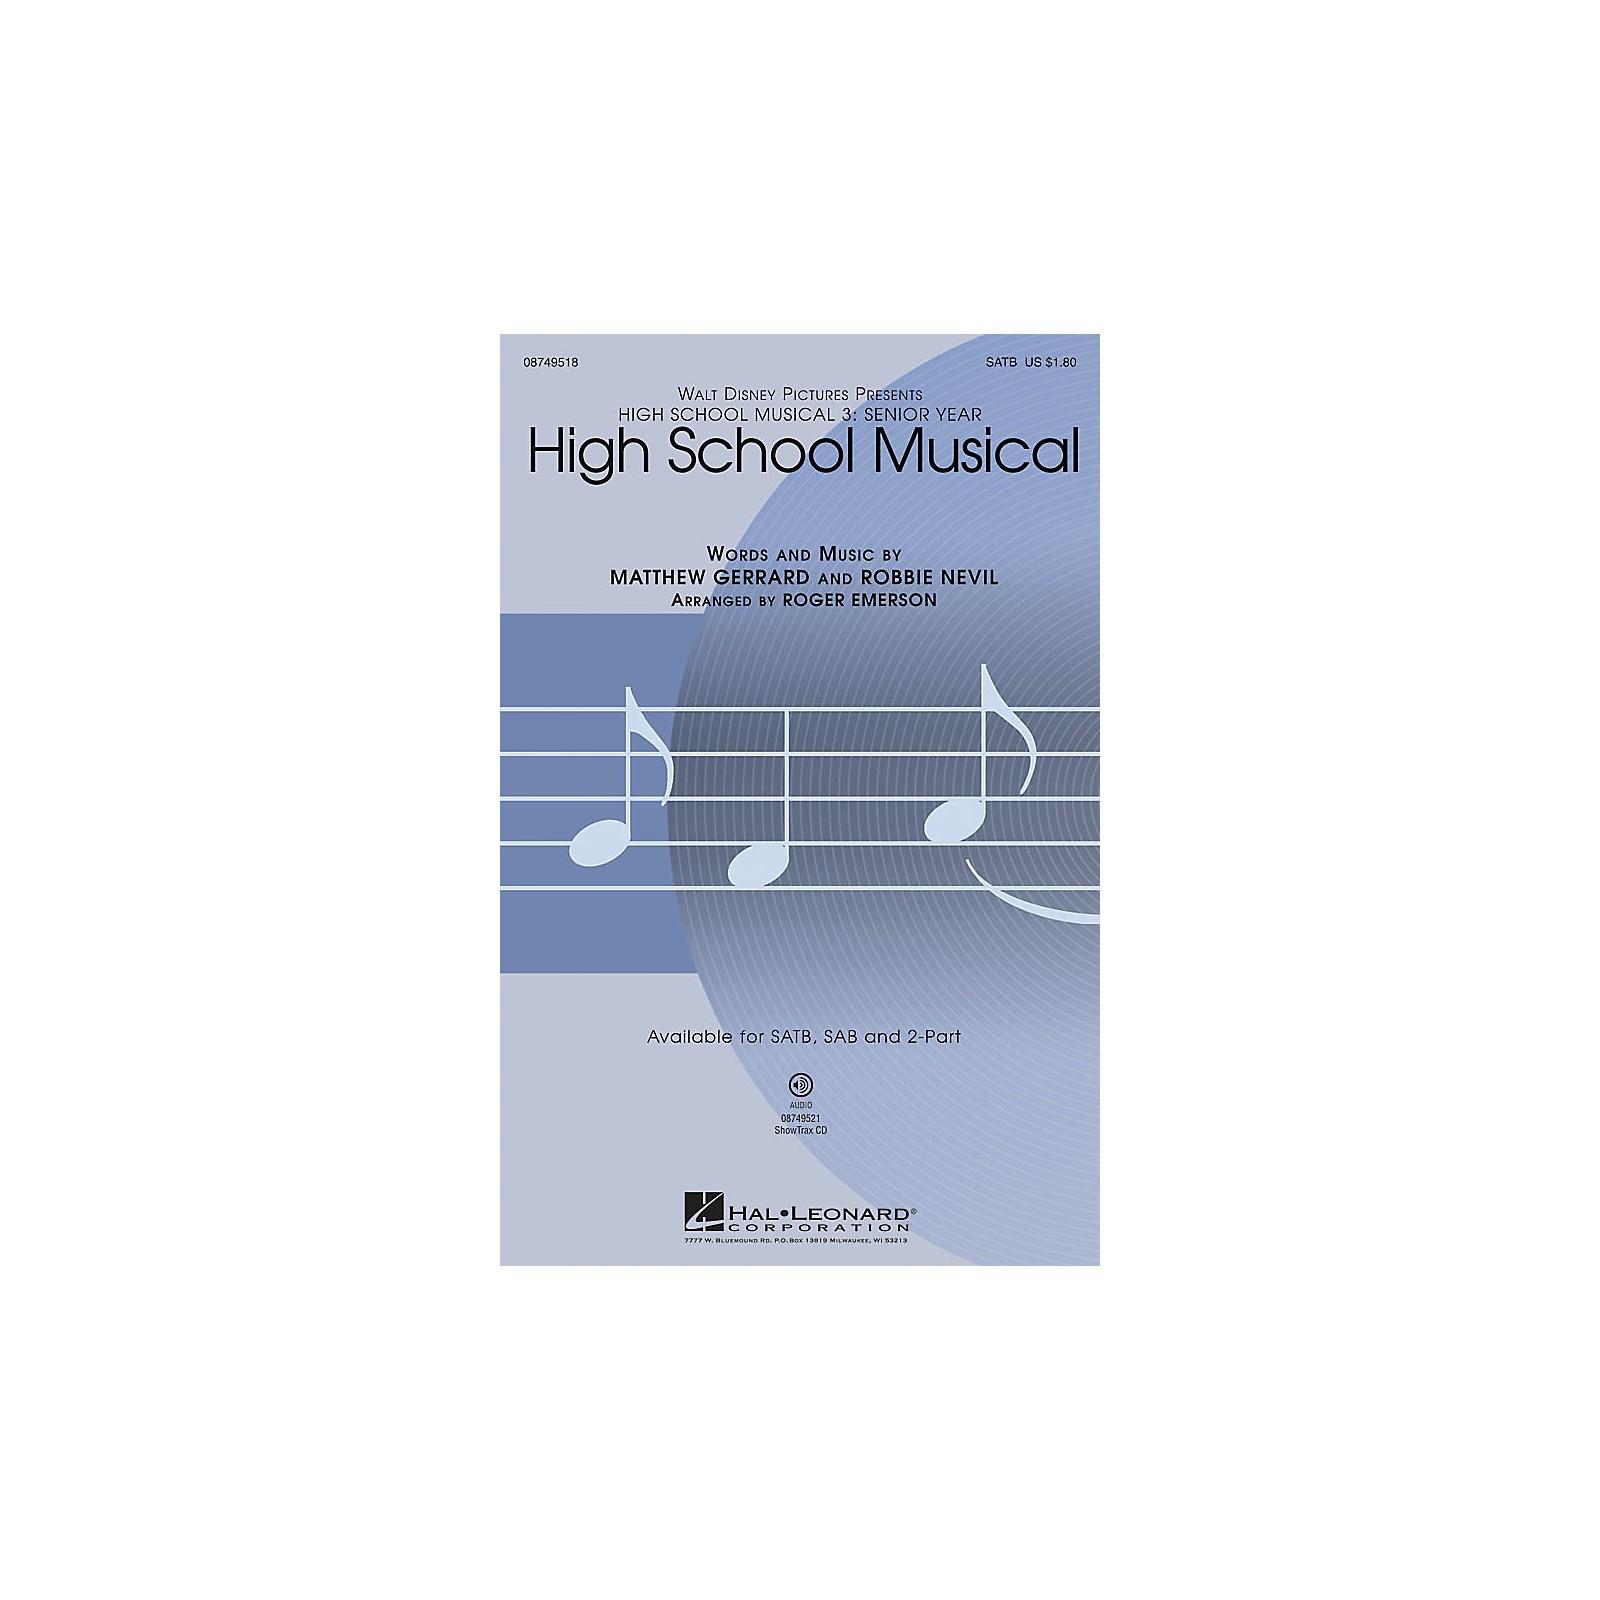 Hal Leonard High School Musical (from High School Musical 3) 2-Part Arranged by Roger Emerson